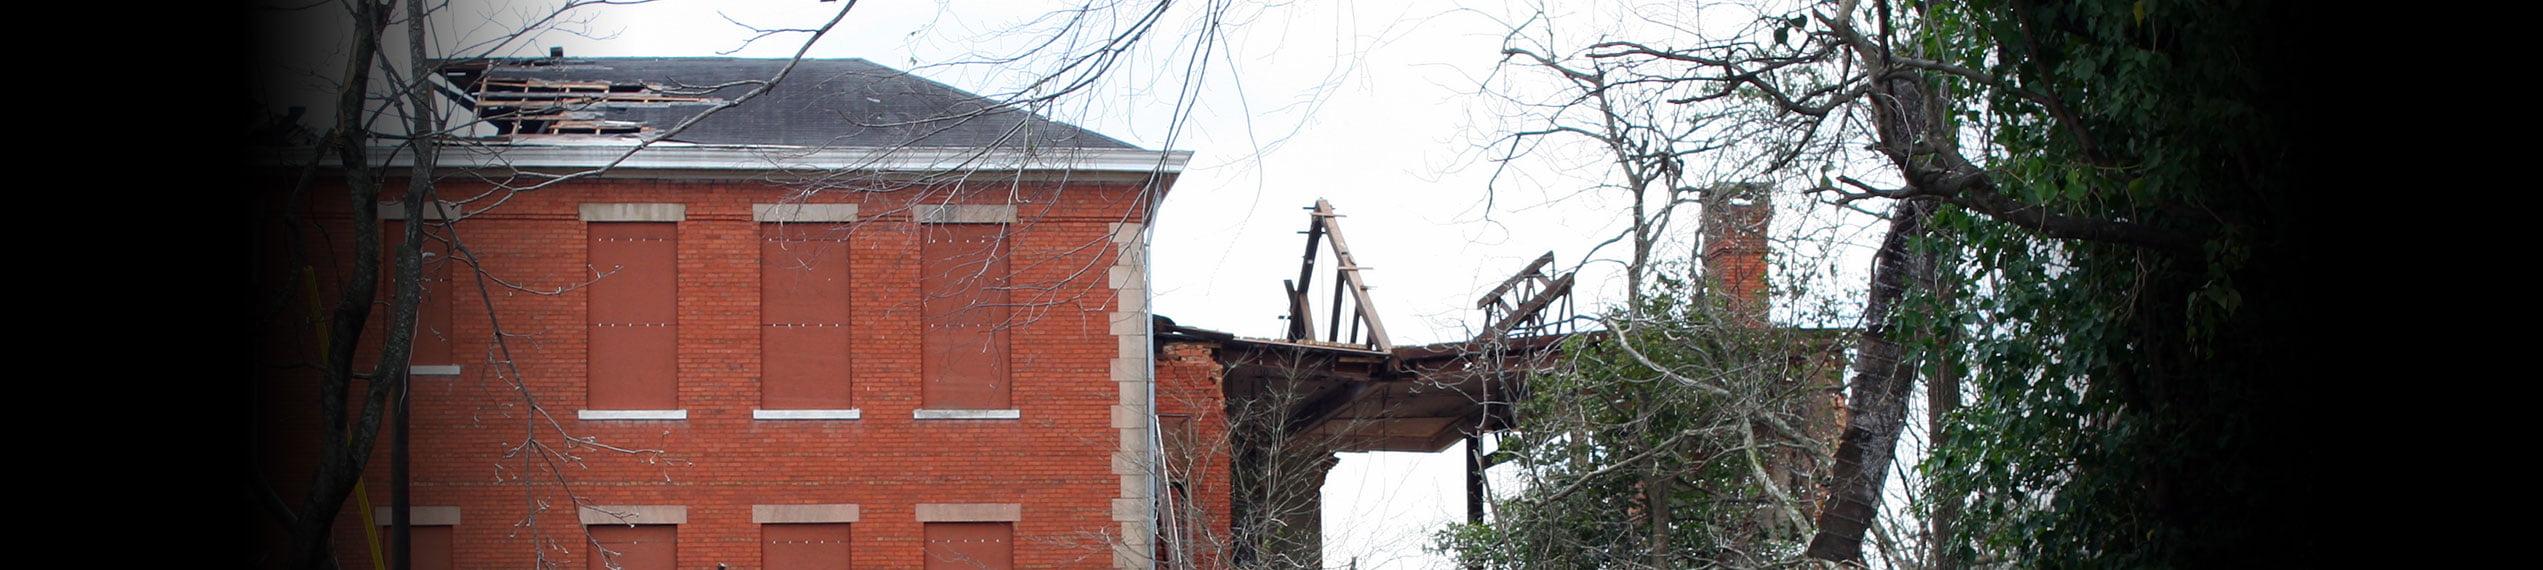 Wind & Storm Damage Repairs in Paul Davis Emergency Services of West Huntsville AL